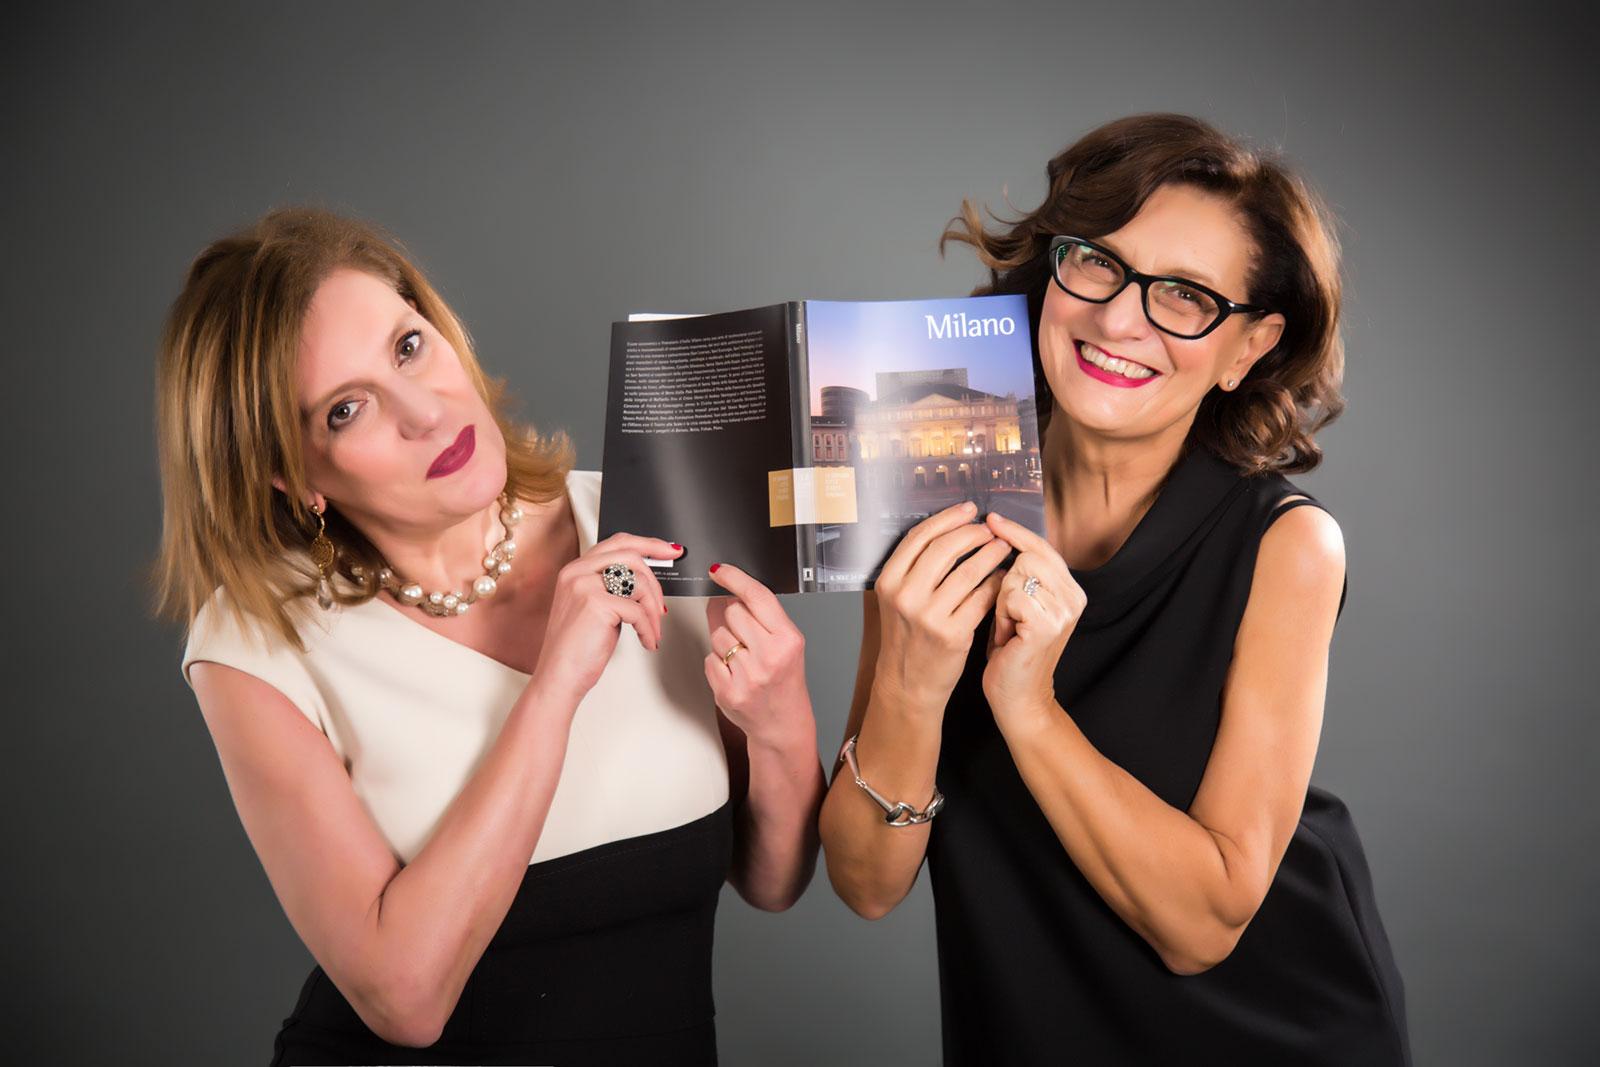 Maria Luisa Ciccone e Anna Chiara Arriga